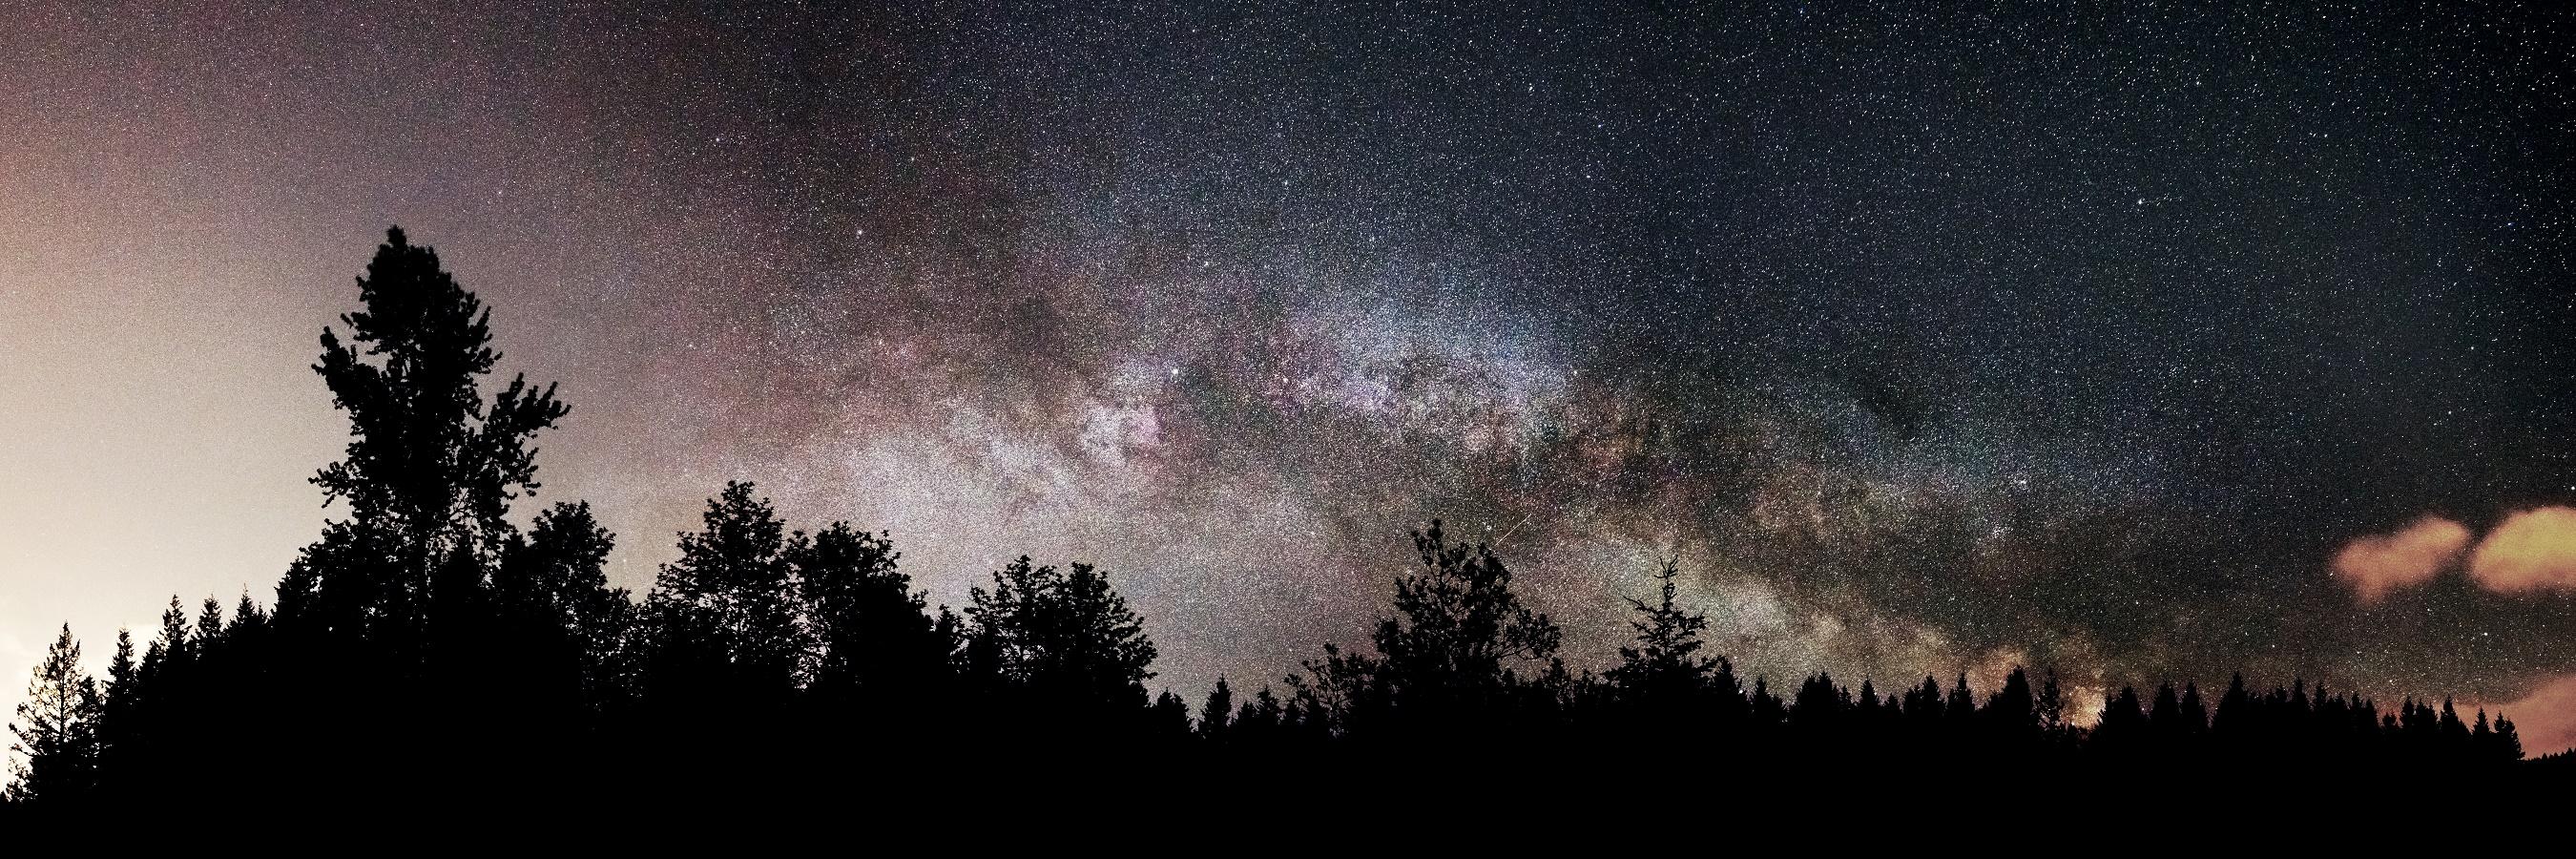 Milky Way Looms Large Over Washington in Amazing Photo